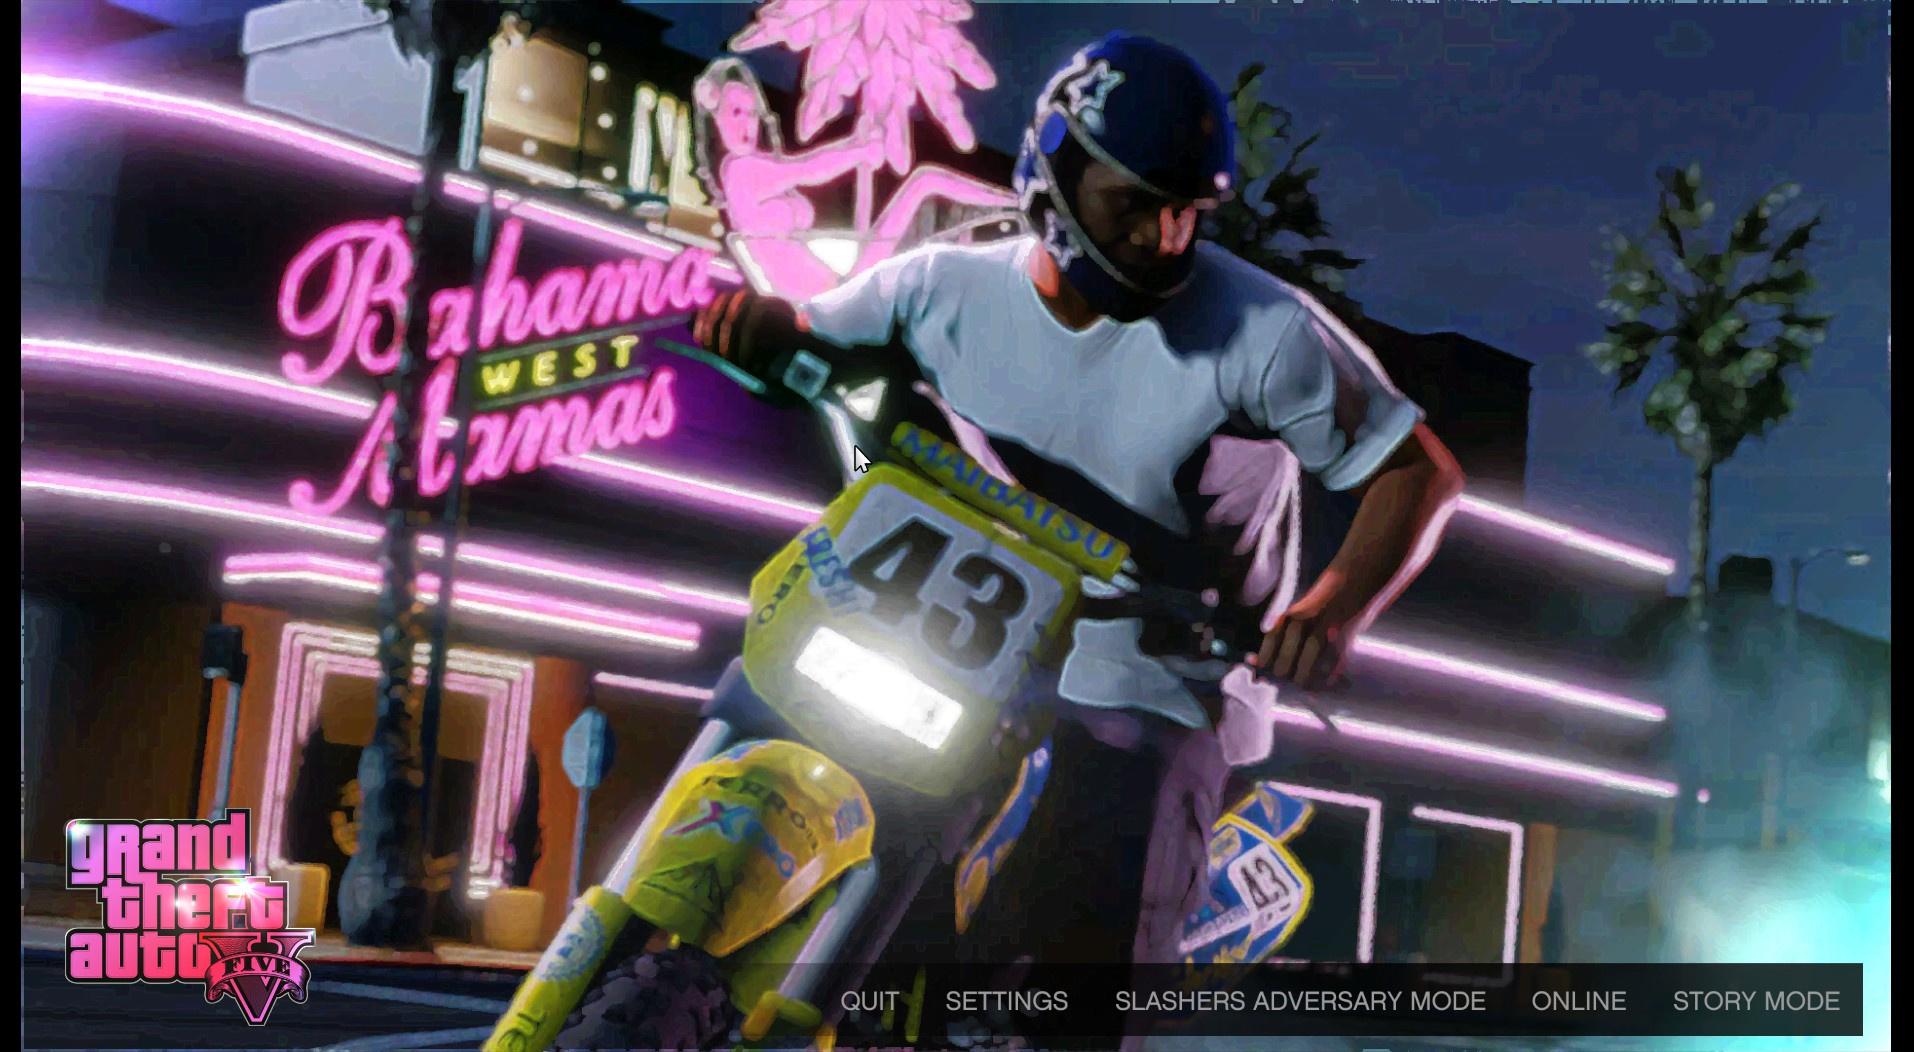 Gta V Nightlife Loading Screen Overhaul Gta5 Mods Com